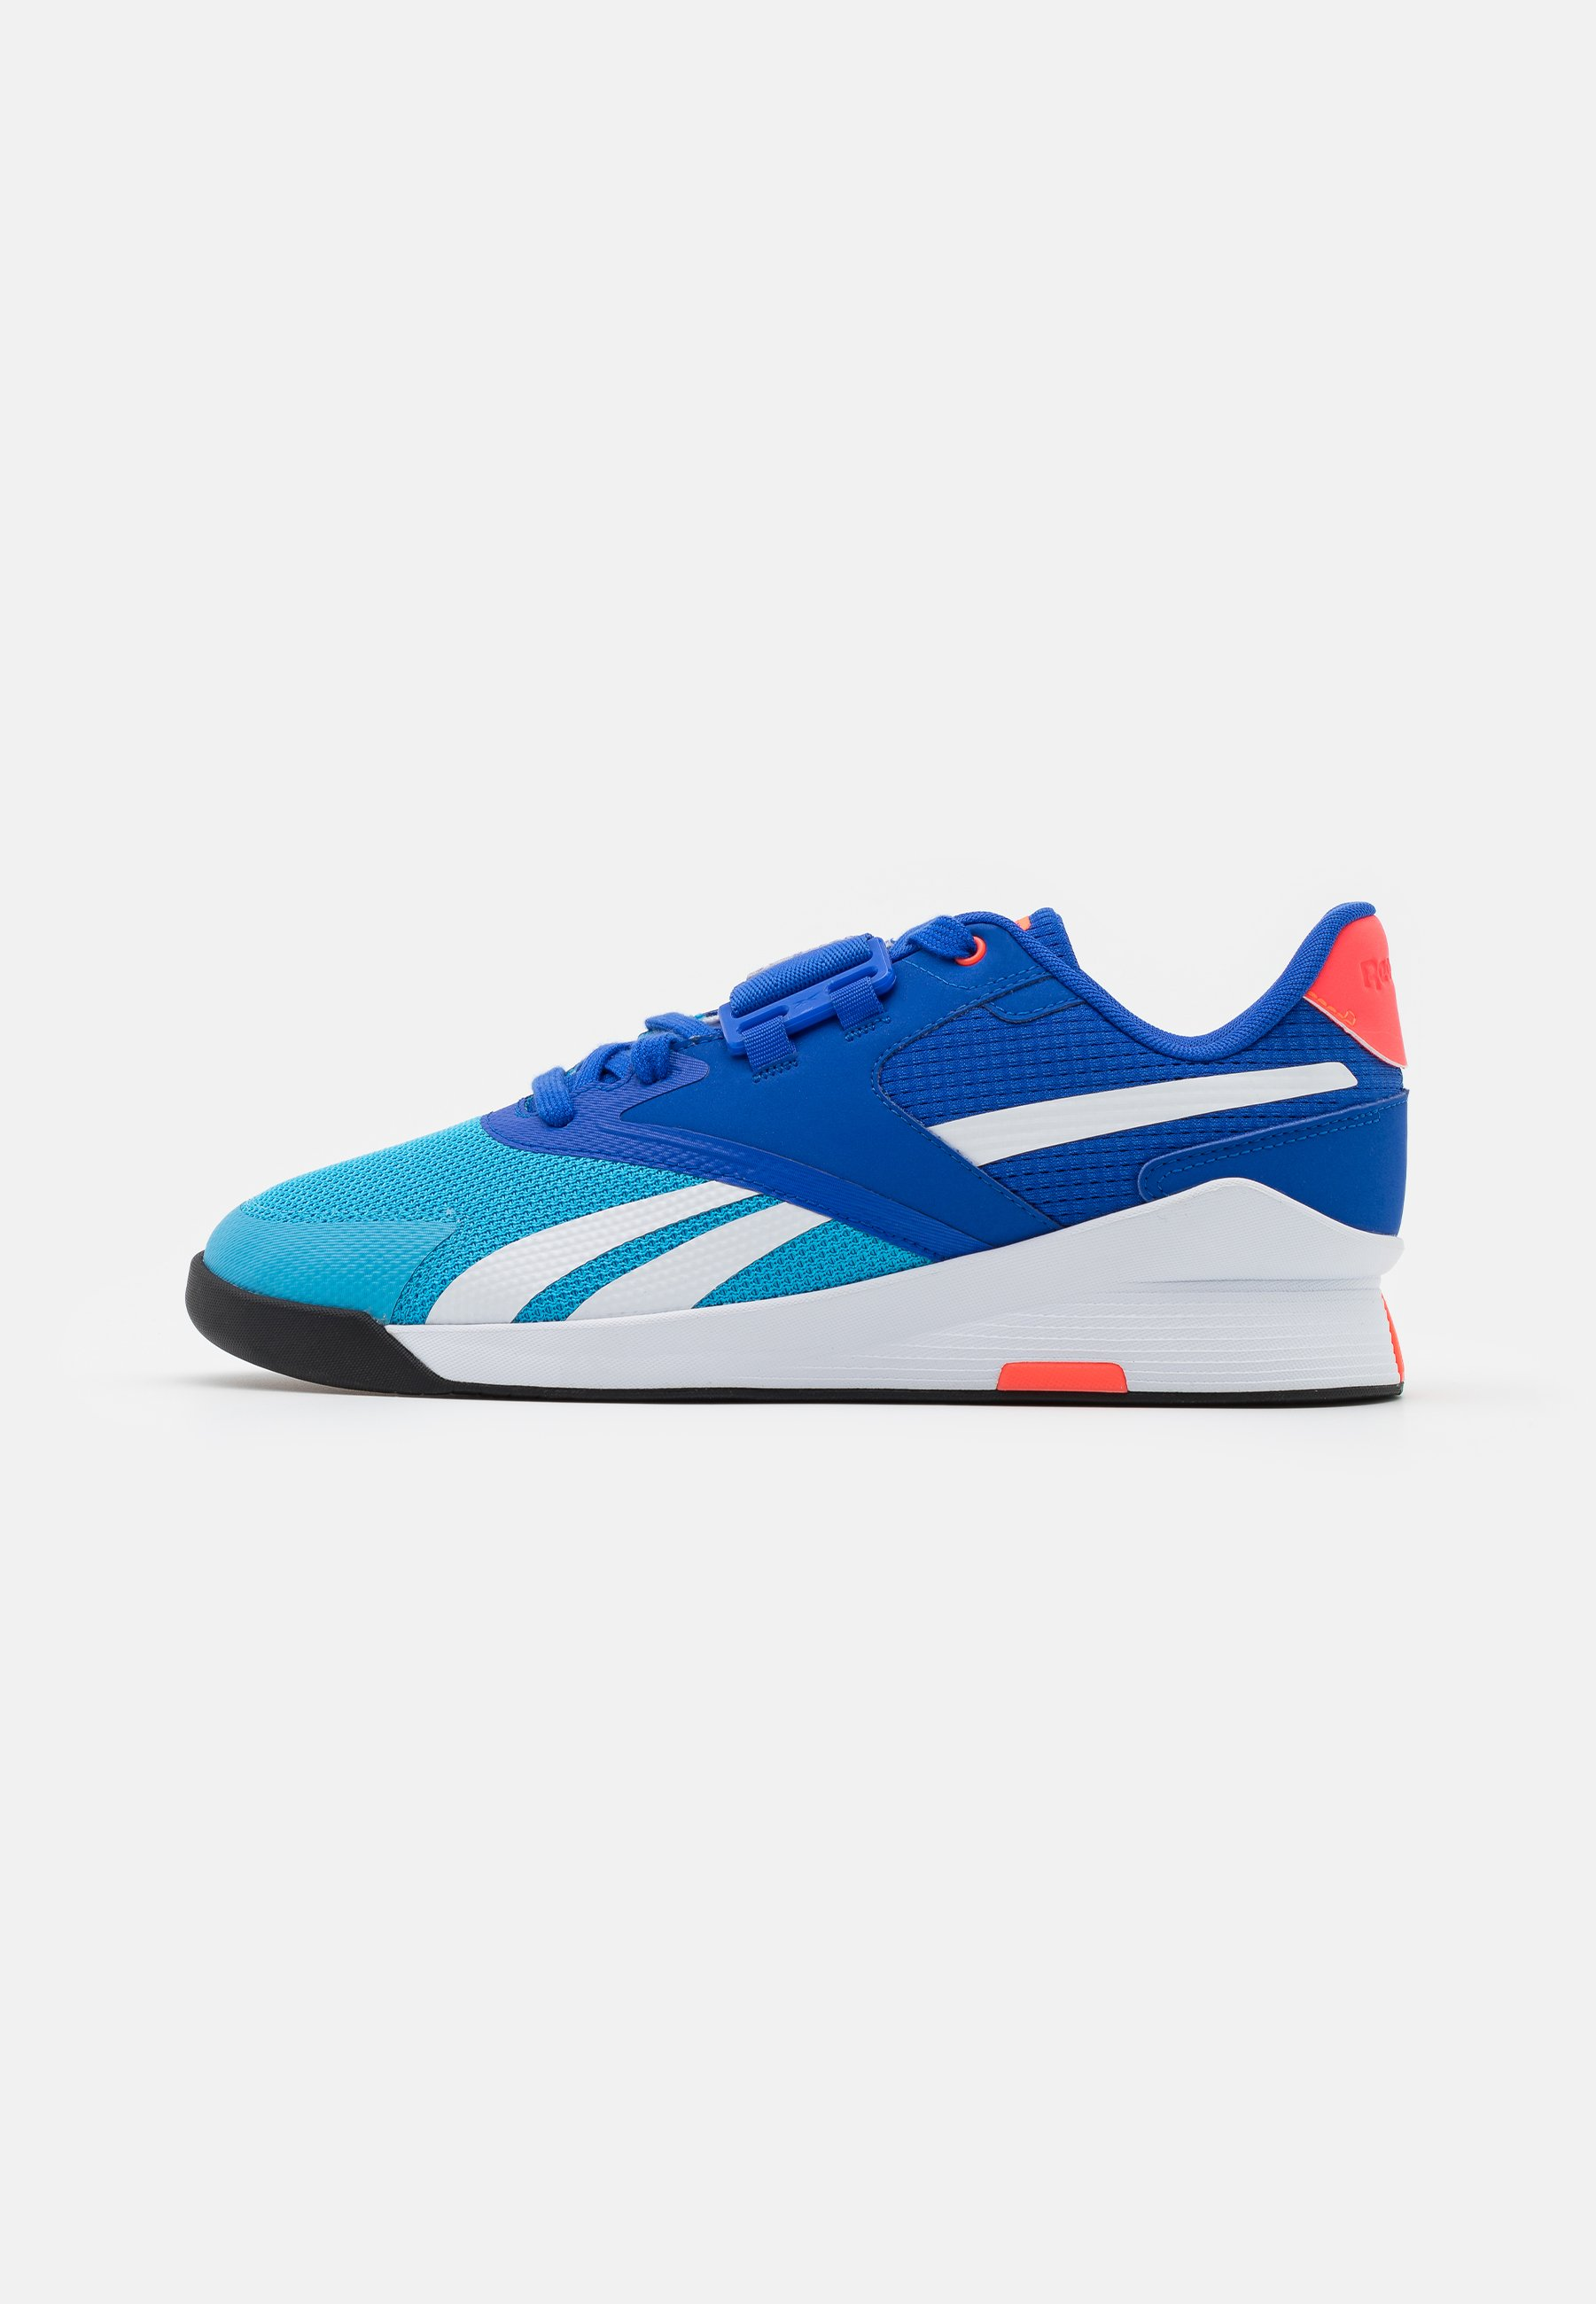 Uomo LIFTER PR II - Scarpe da fitness - radiate aqua/court blue/footwear white